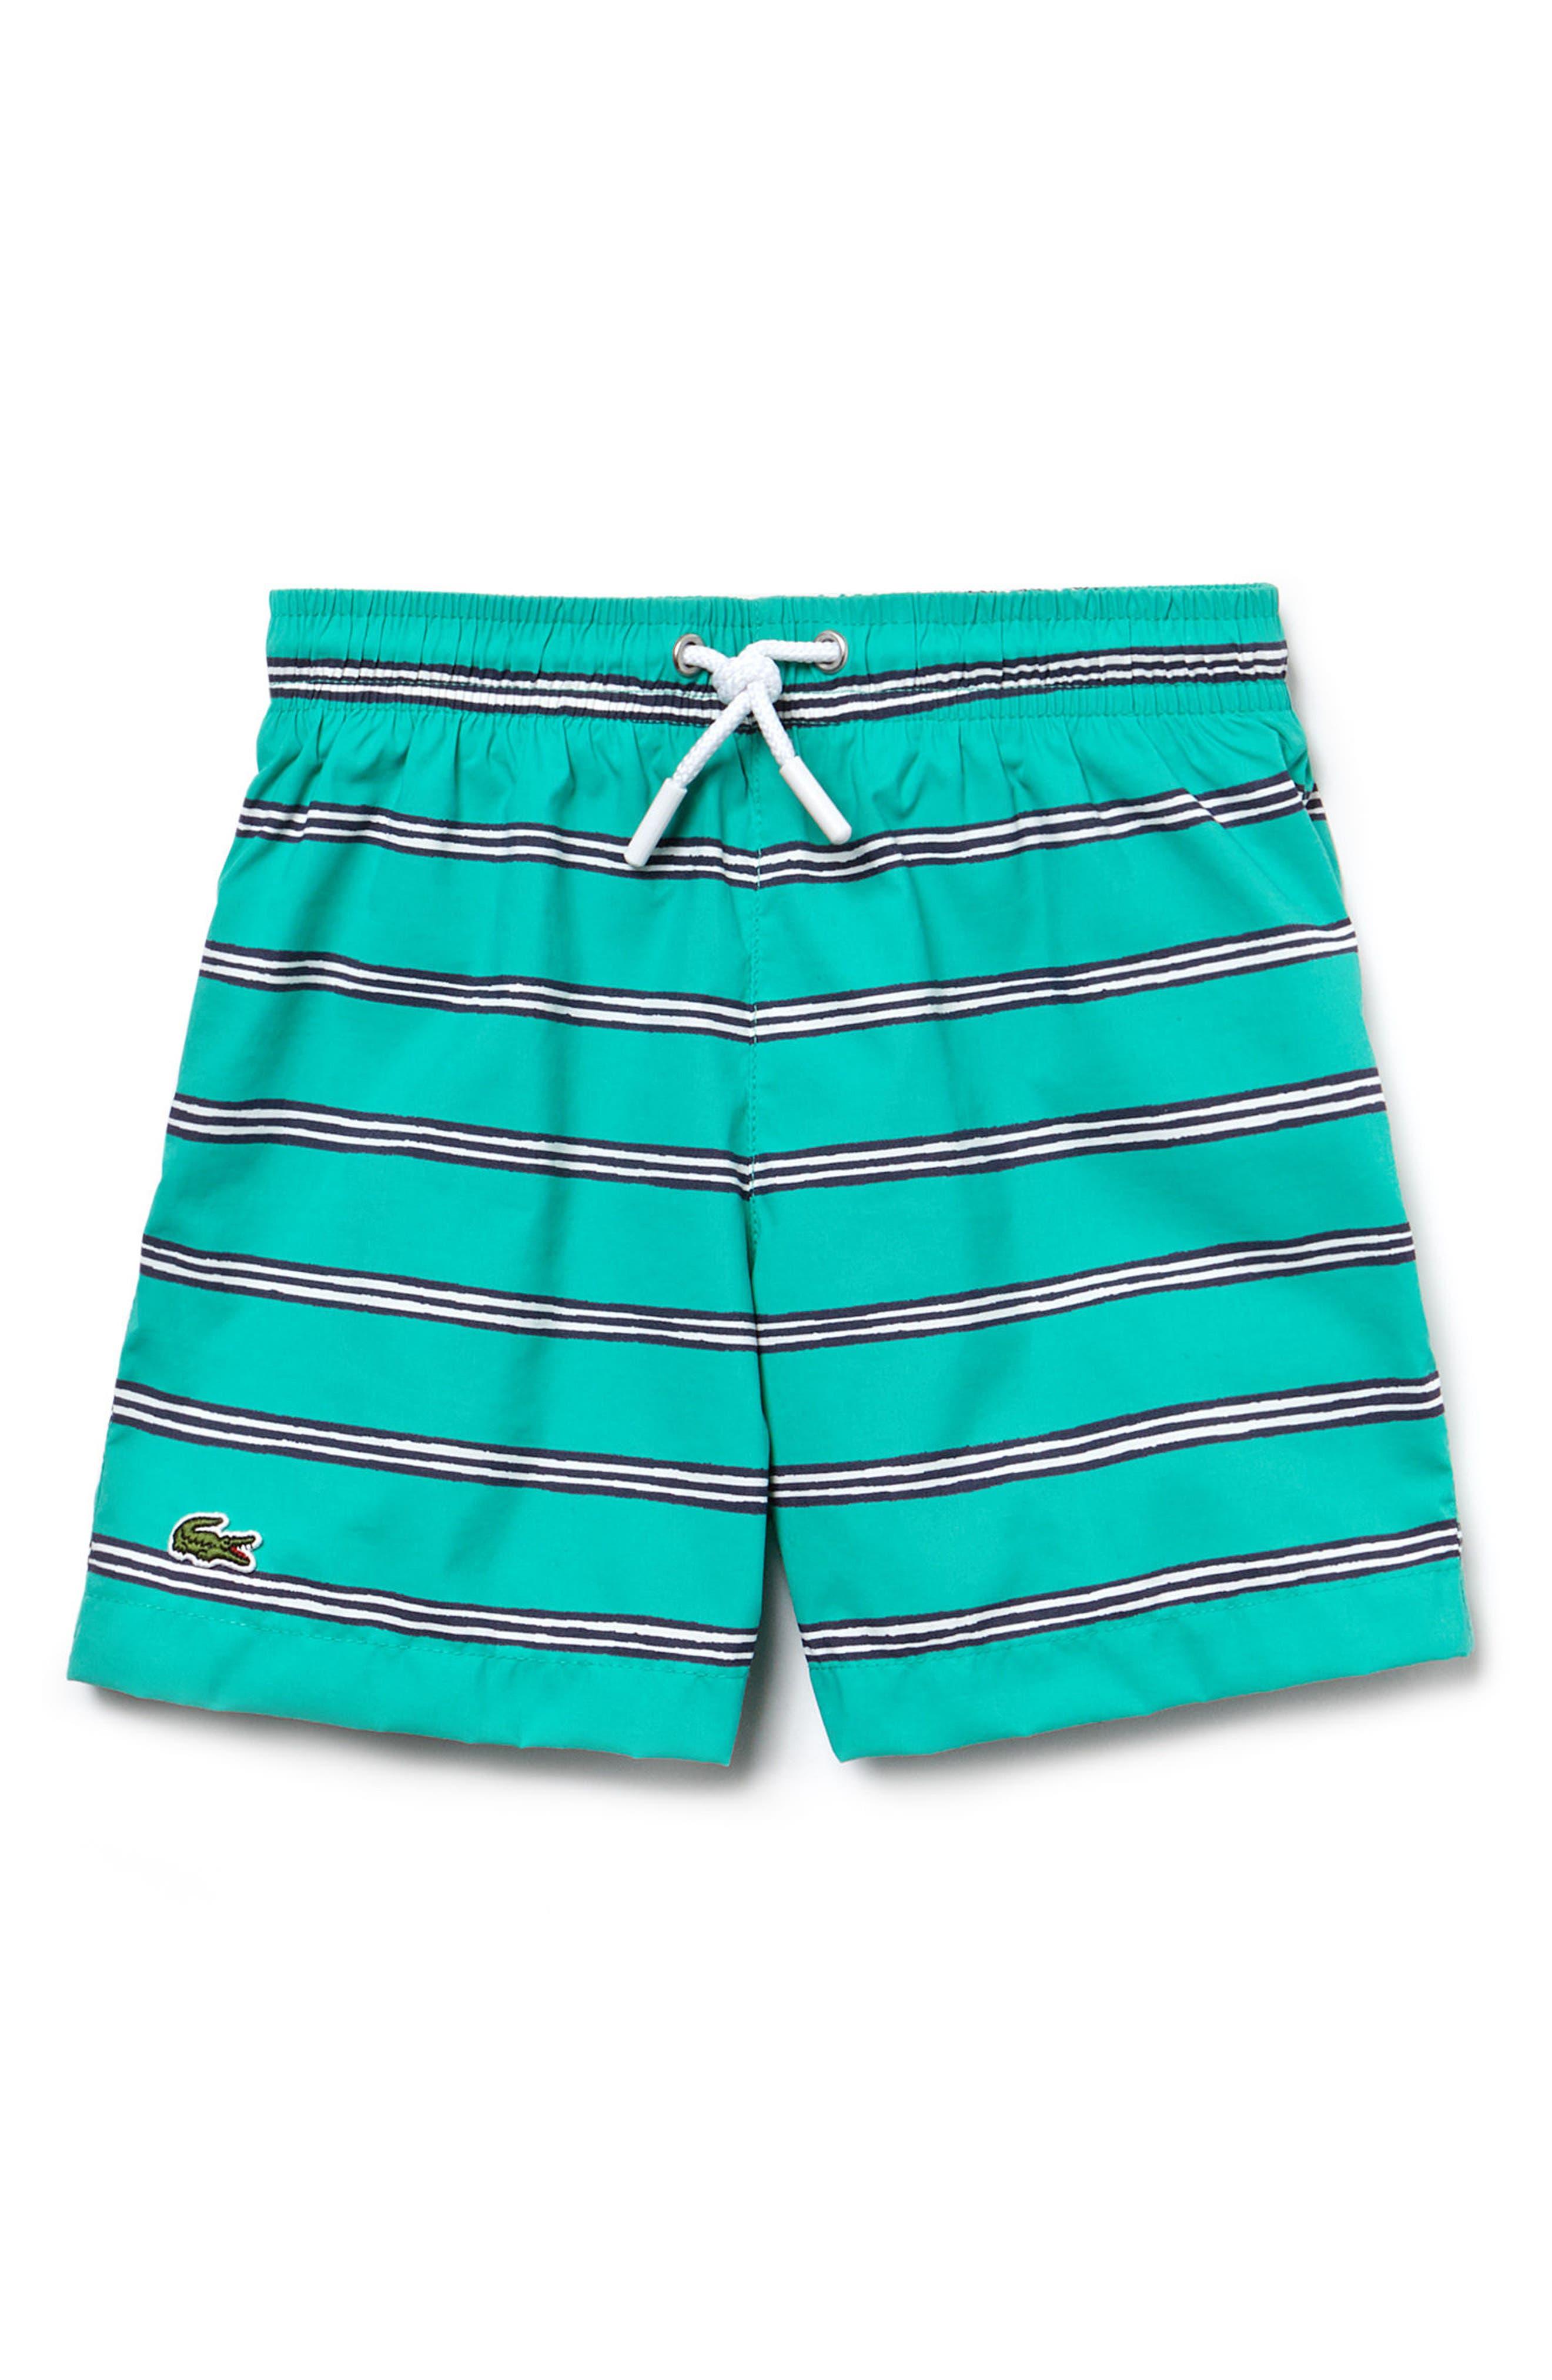 Stripe Swim Trunks,                         Main,                         color, Earthenware Green